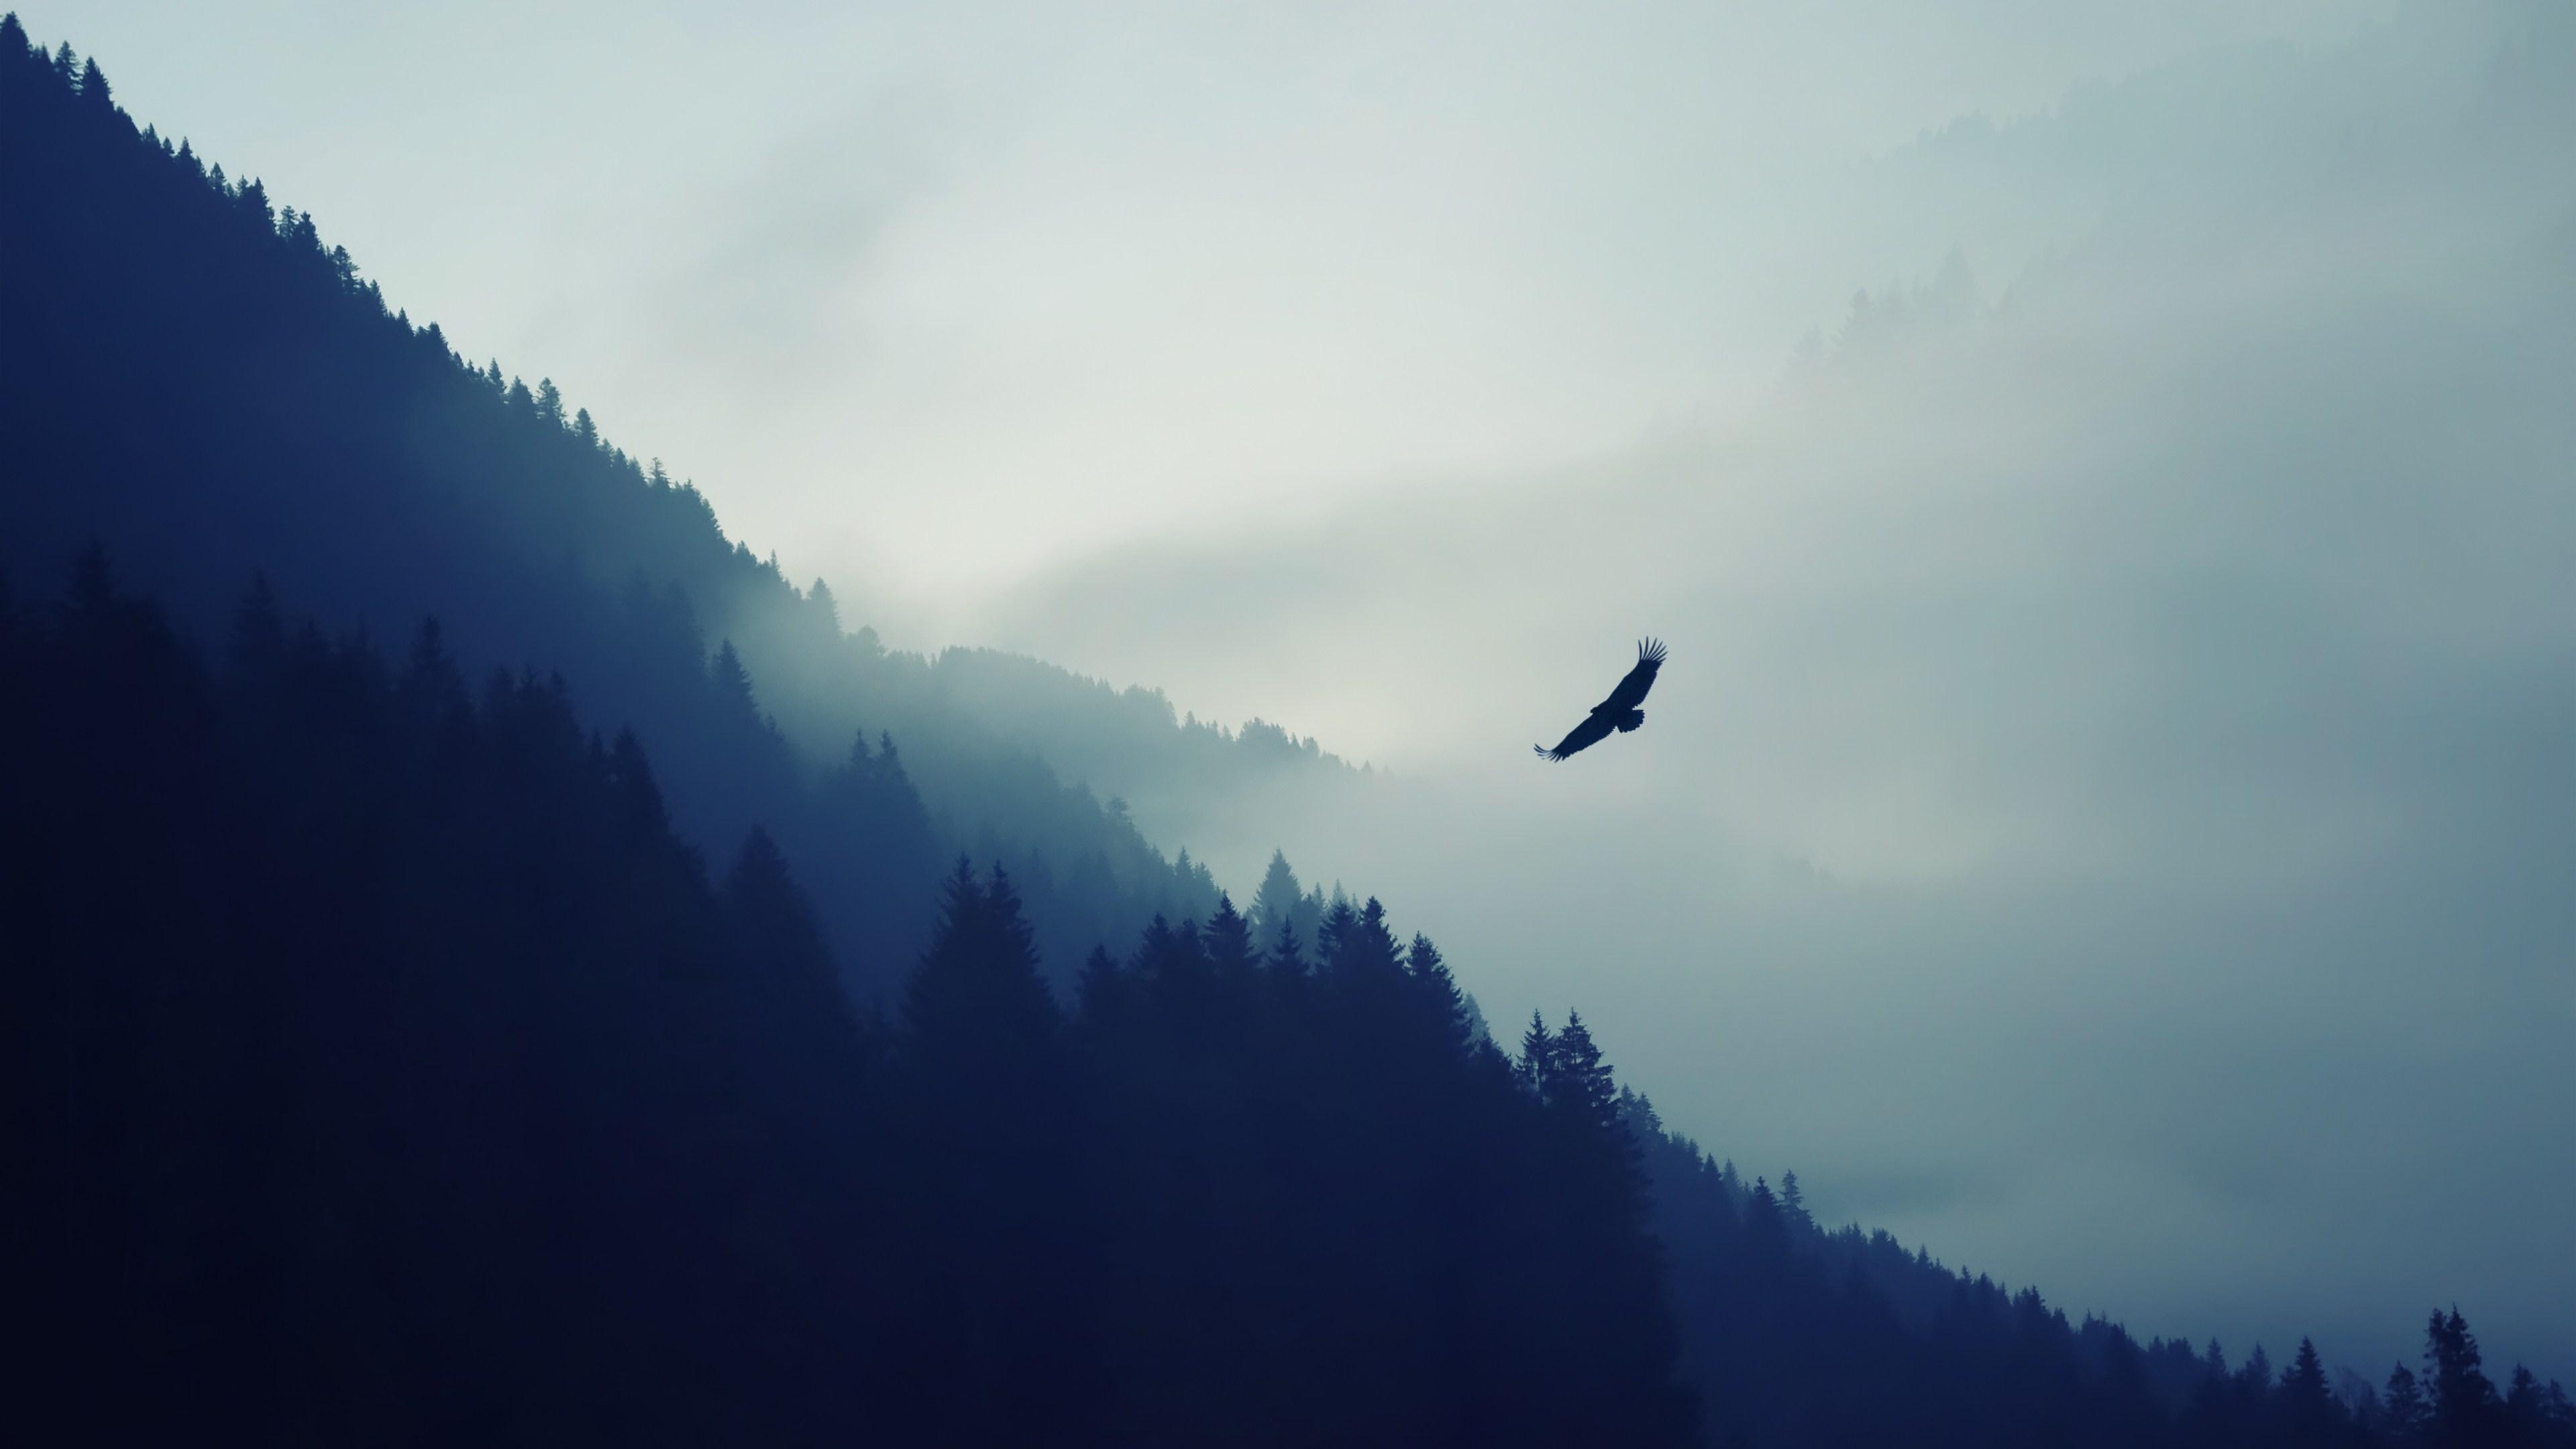 Nature Mountain Eagle Fog Landscape Ultrahd 4k Wallpaper Wallpaper, hd walepaper, free wallpaper